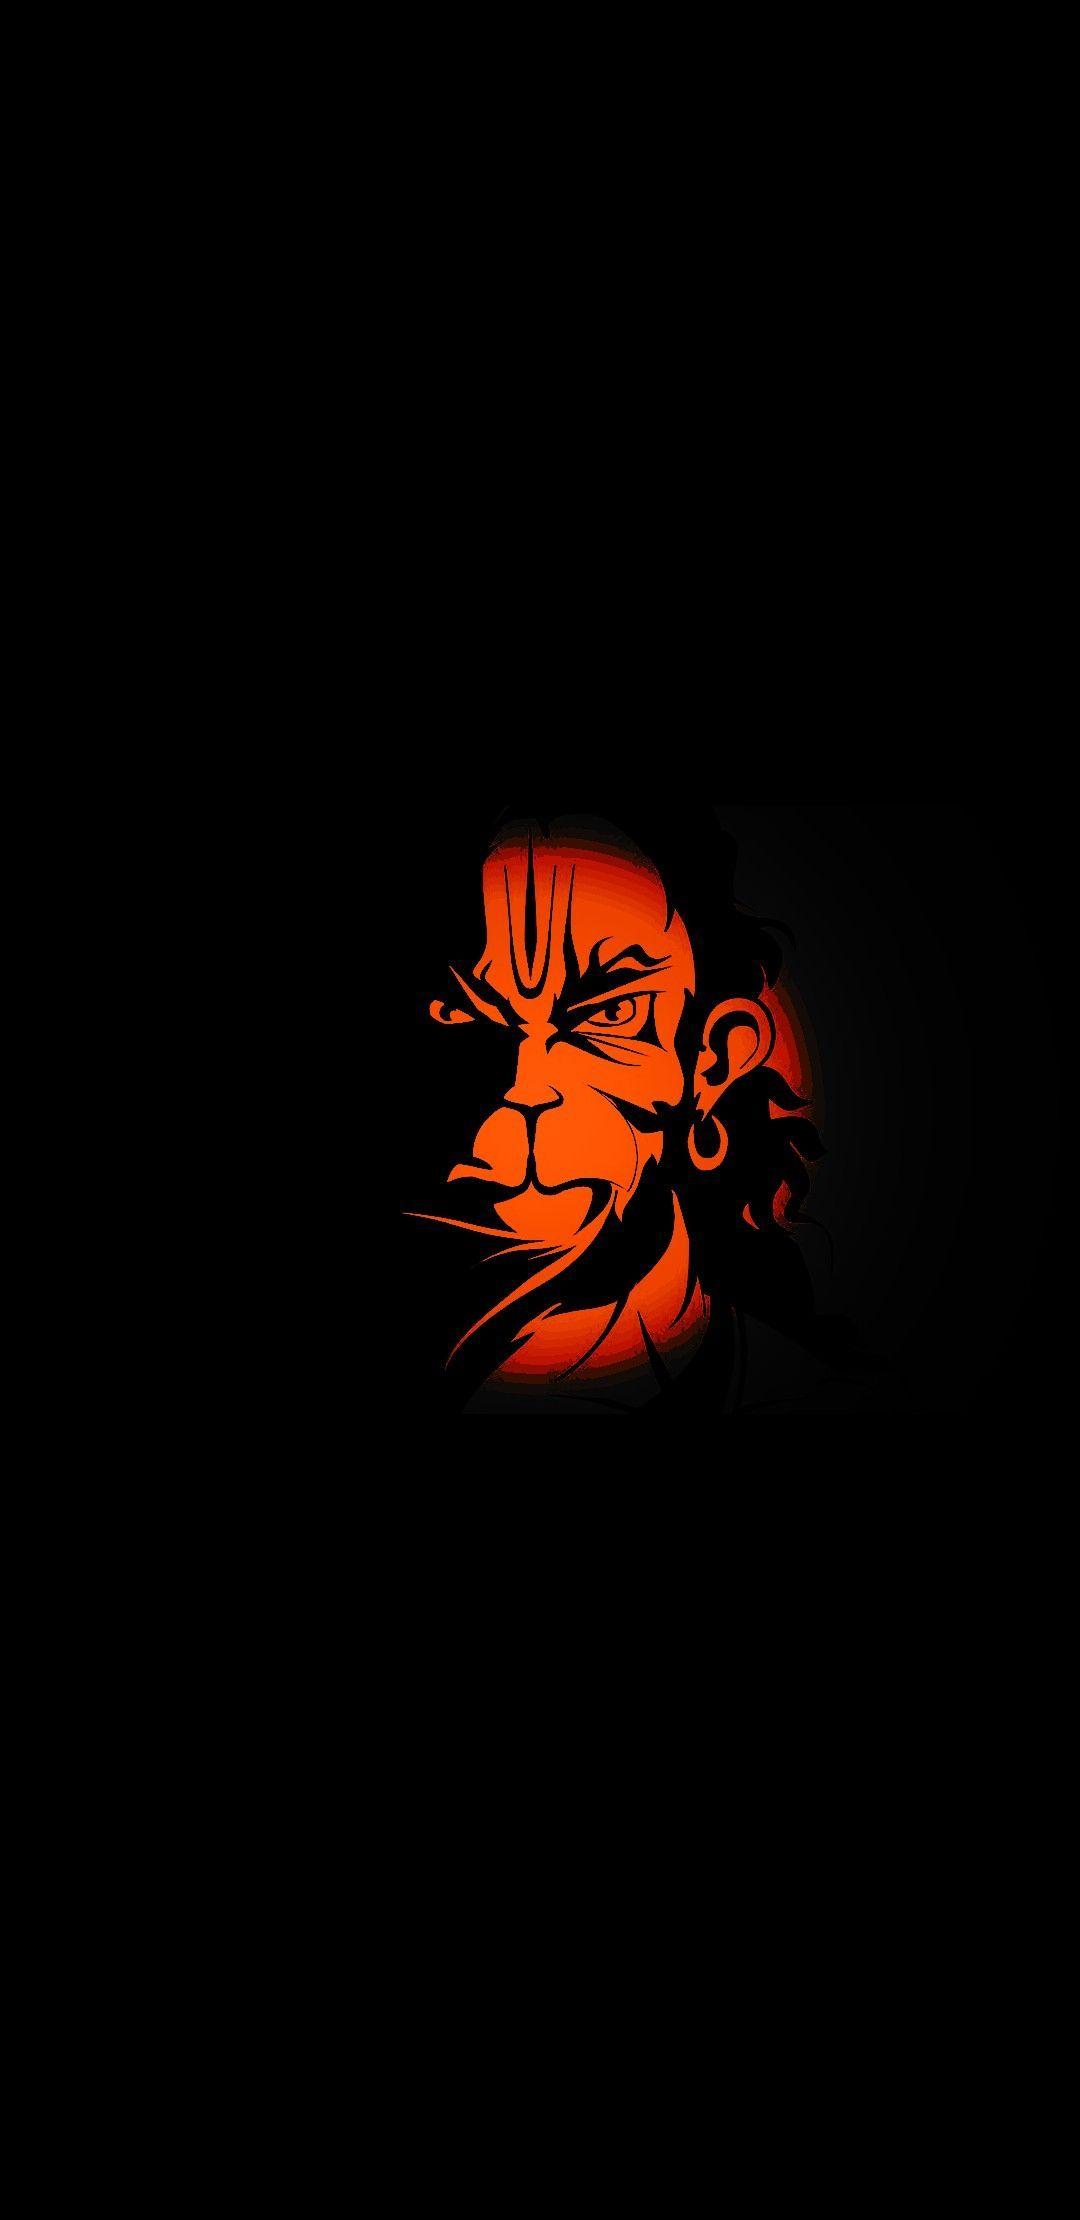 Pin By Thyaga Rajan On God Lord Hanuman Wallpapers Hanuman Wallpaper Lord Shiva Hd Wallpaper